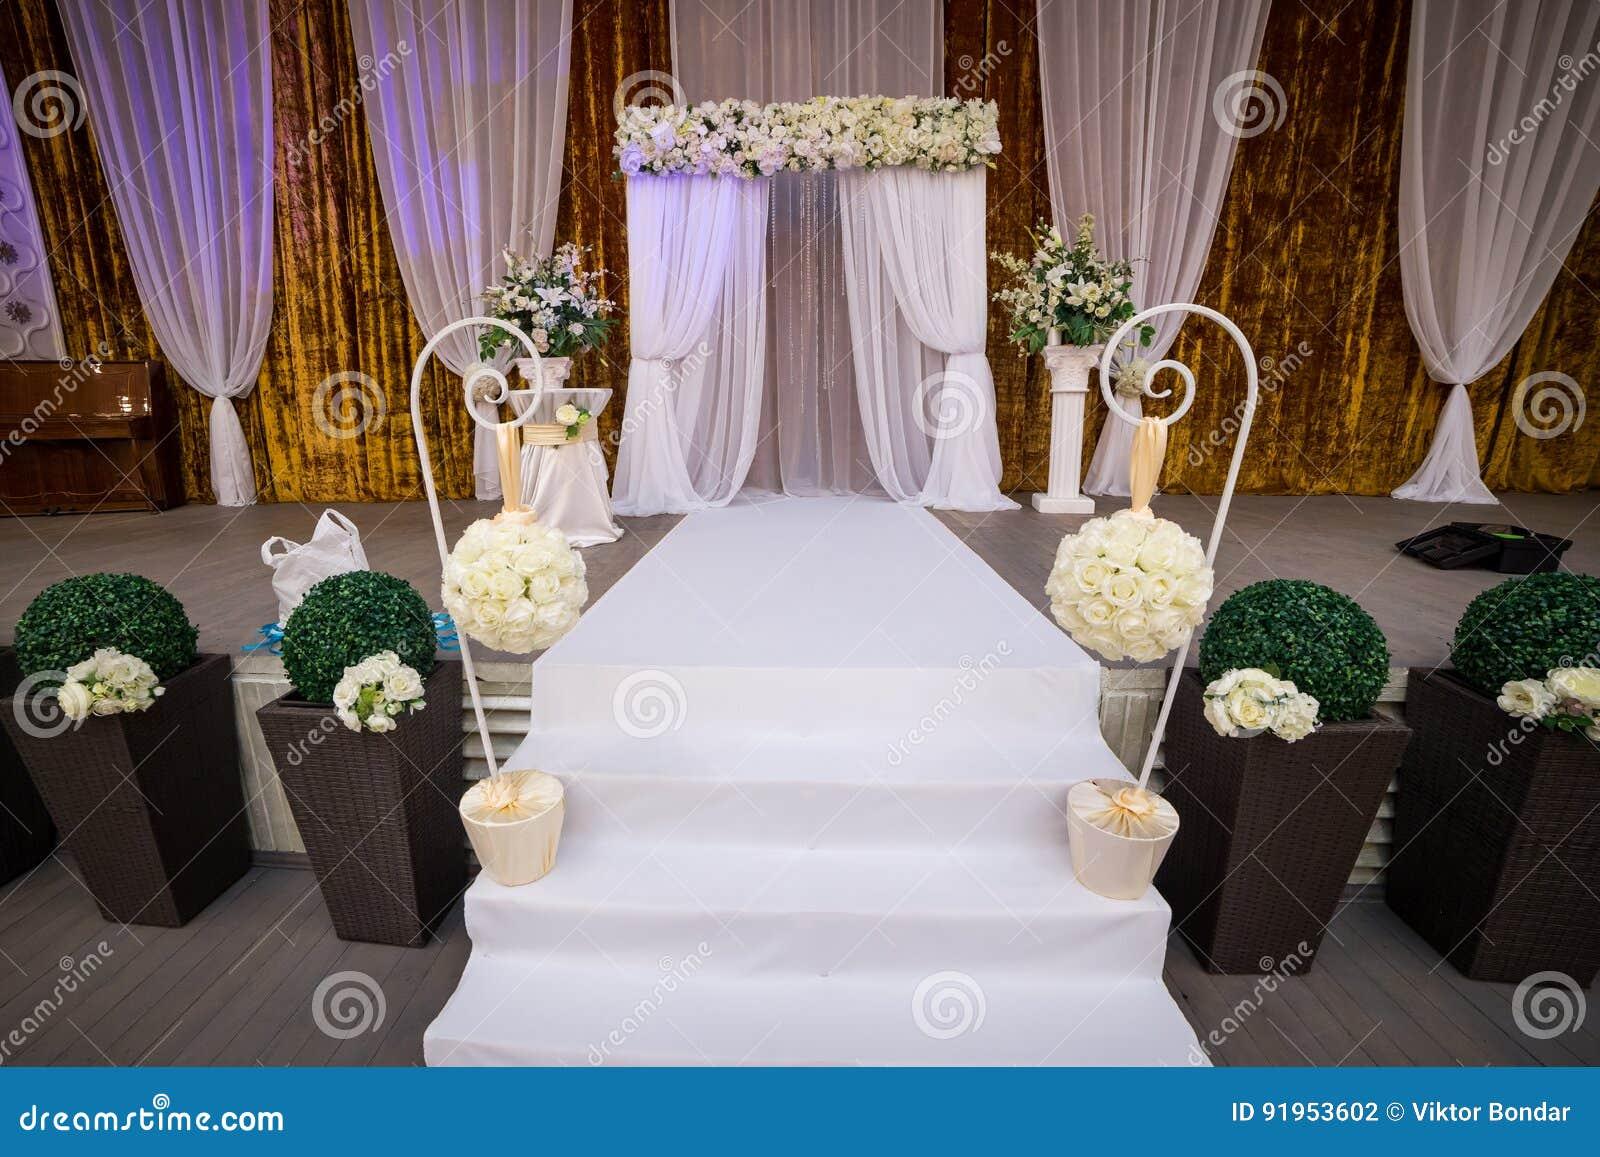 Luxury Wedding Indoor: Indoor Wedding Reception Hall Royalty-Free Stock Image